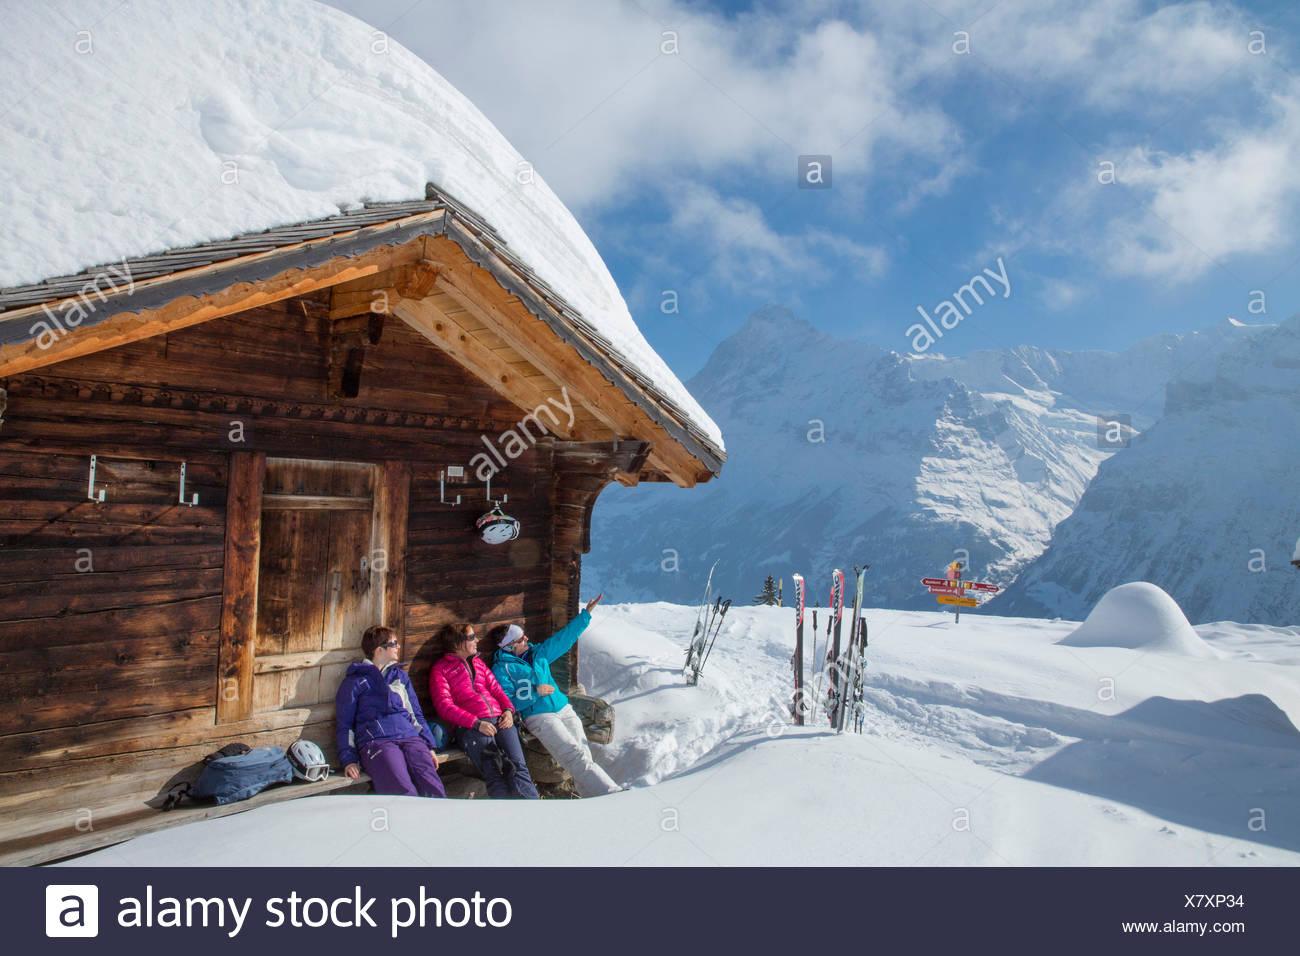 Ski, Ski-Tourist, Grindelwald, ridge, Eigers, Berg, Berge, Ski, Skifahren, Carving, Winter, Wintersport, Kanton Bern, Ber Stockbild